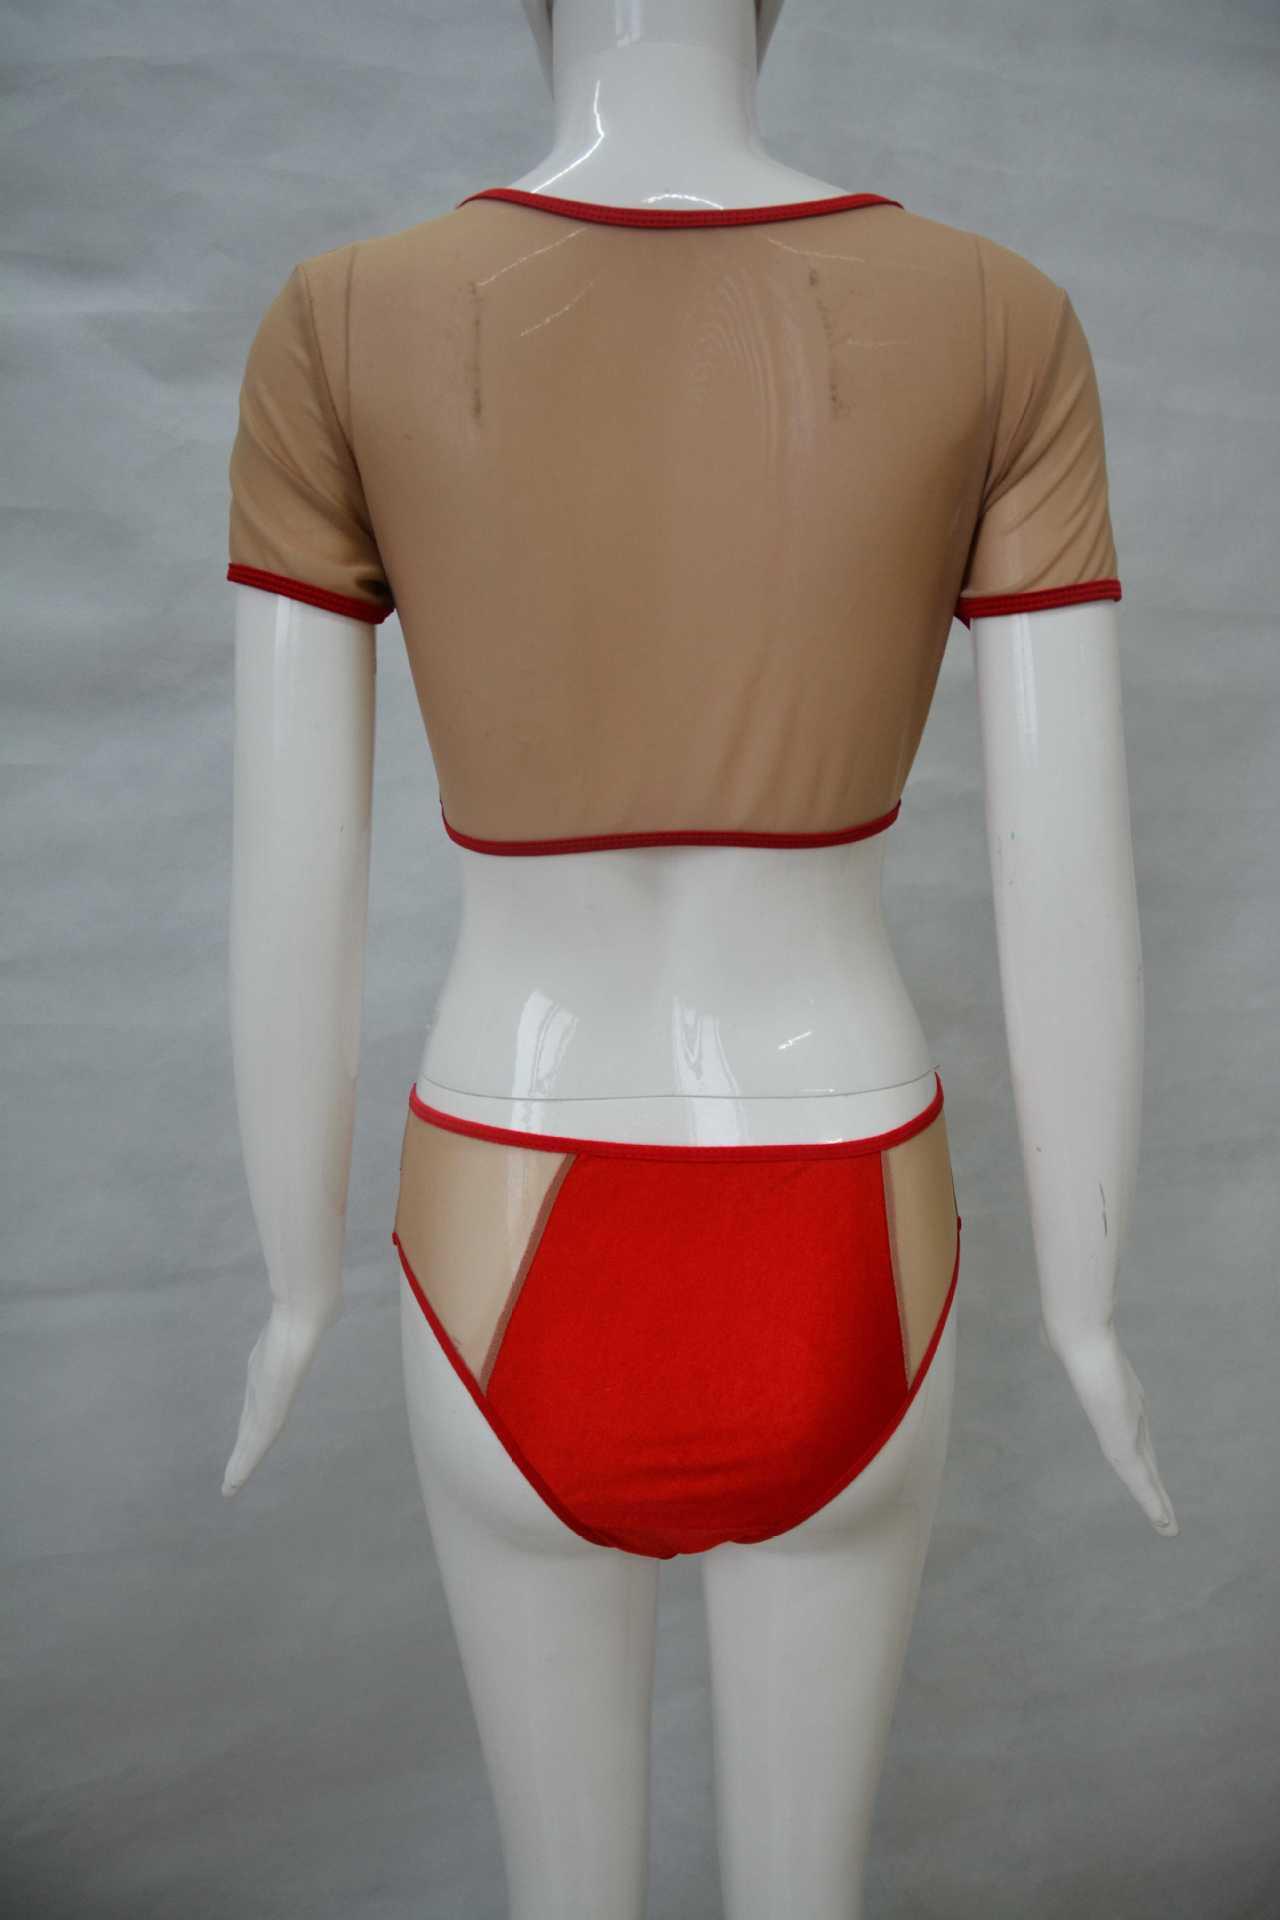 7d4ce4ca1e bow bikini XL neopreno traje de bano mujer acacia swimwear thong bathing  suits two piece swimsuit for women swimsuit triangle on Aliexpress.com |  Alibaba ...